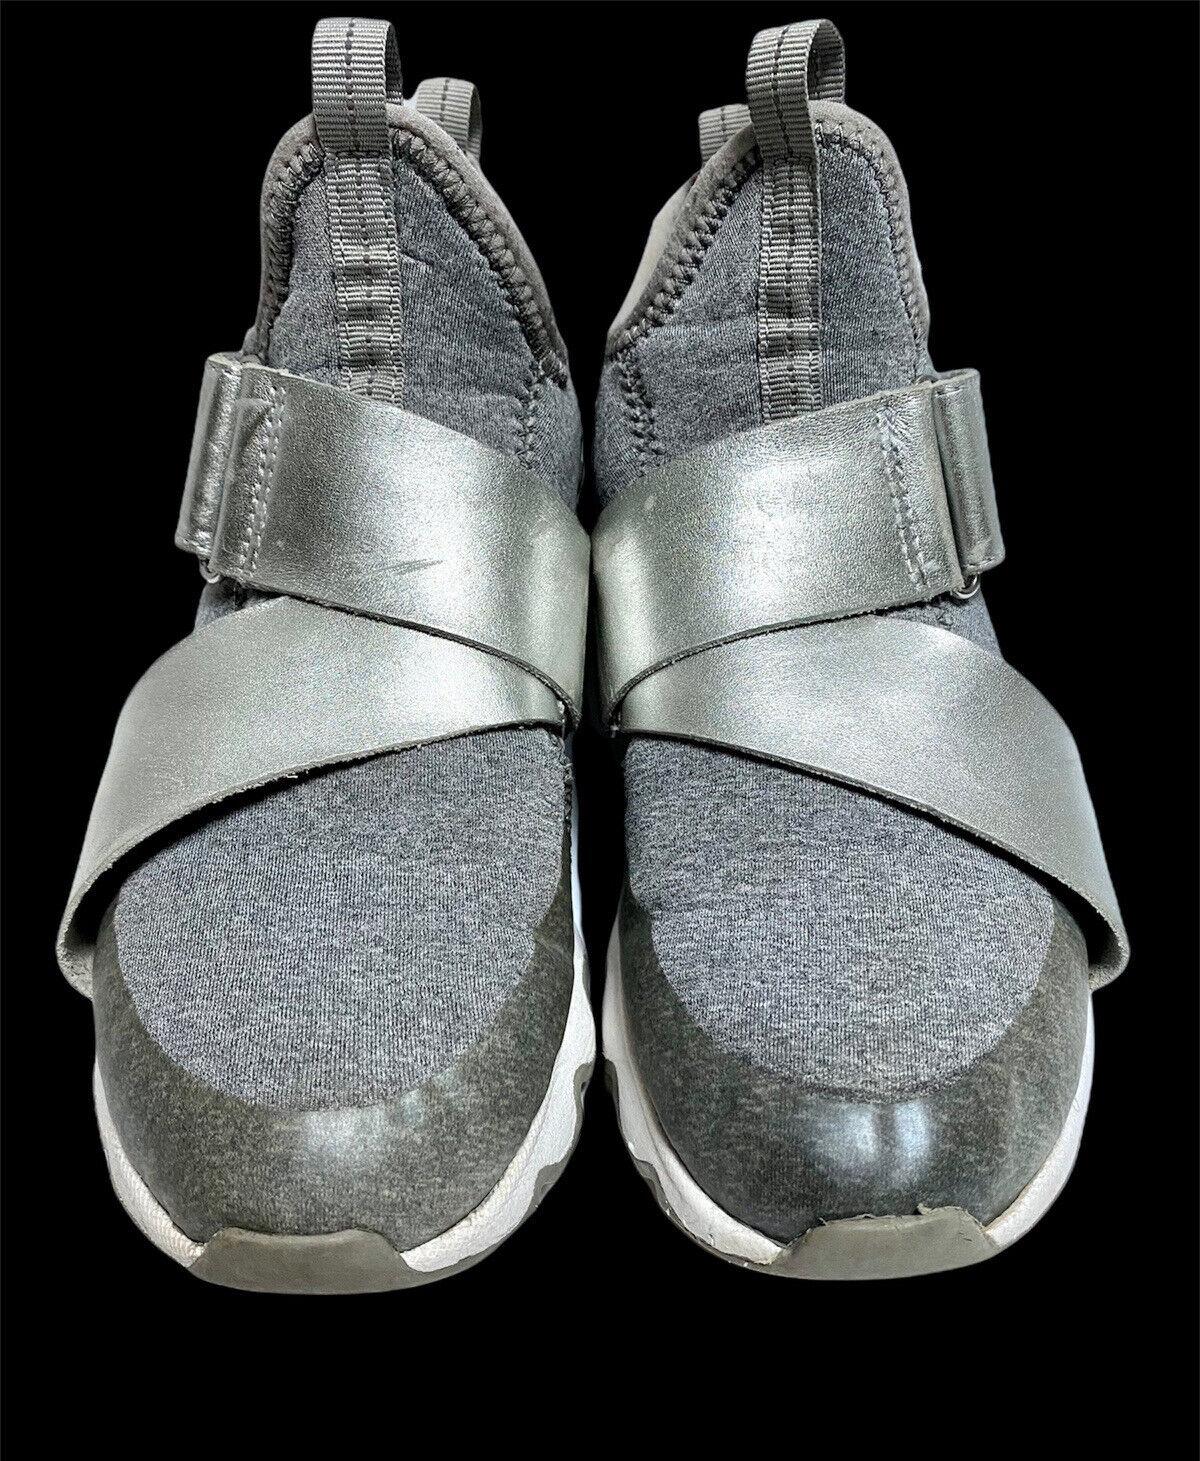 Sorel Kinetic Sneaker Women's High Top Trainer Gray Silver Space Shoe - Size 7